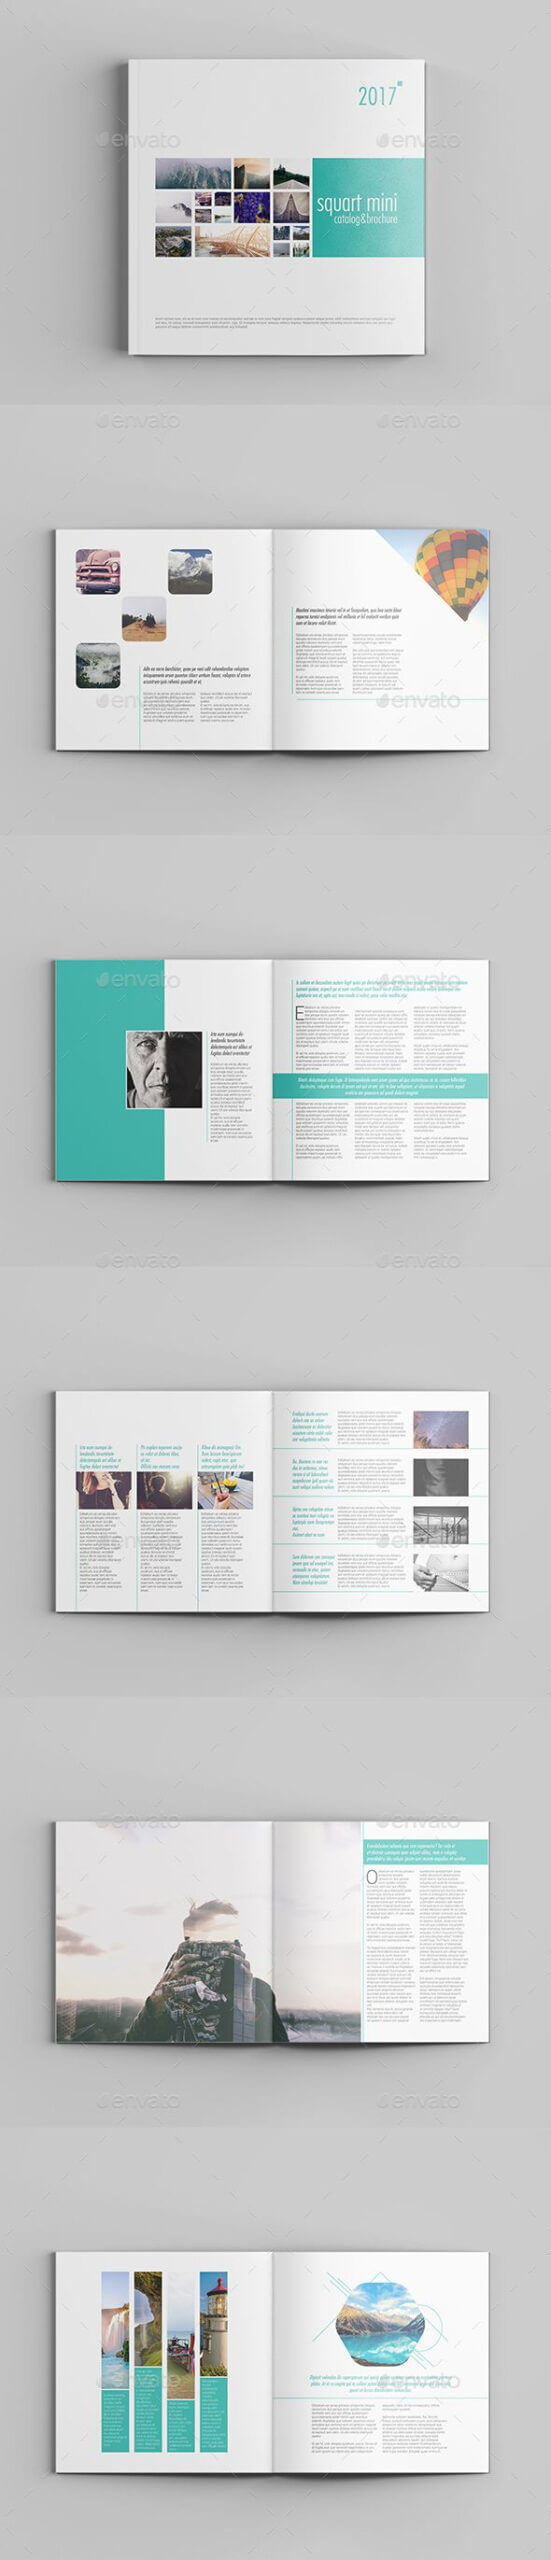 Pincool Design On Brochure Design   Booklet Design, Book Intended For 12 Page Brochure Template